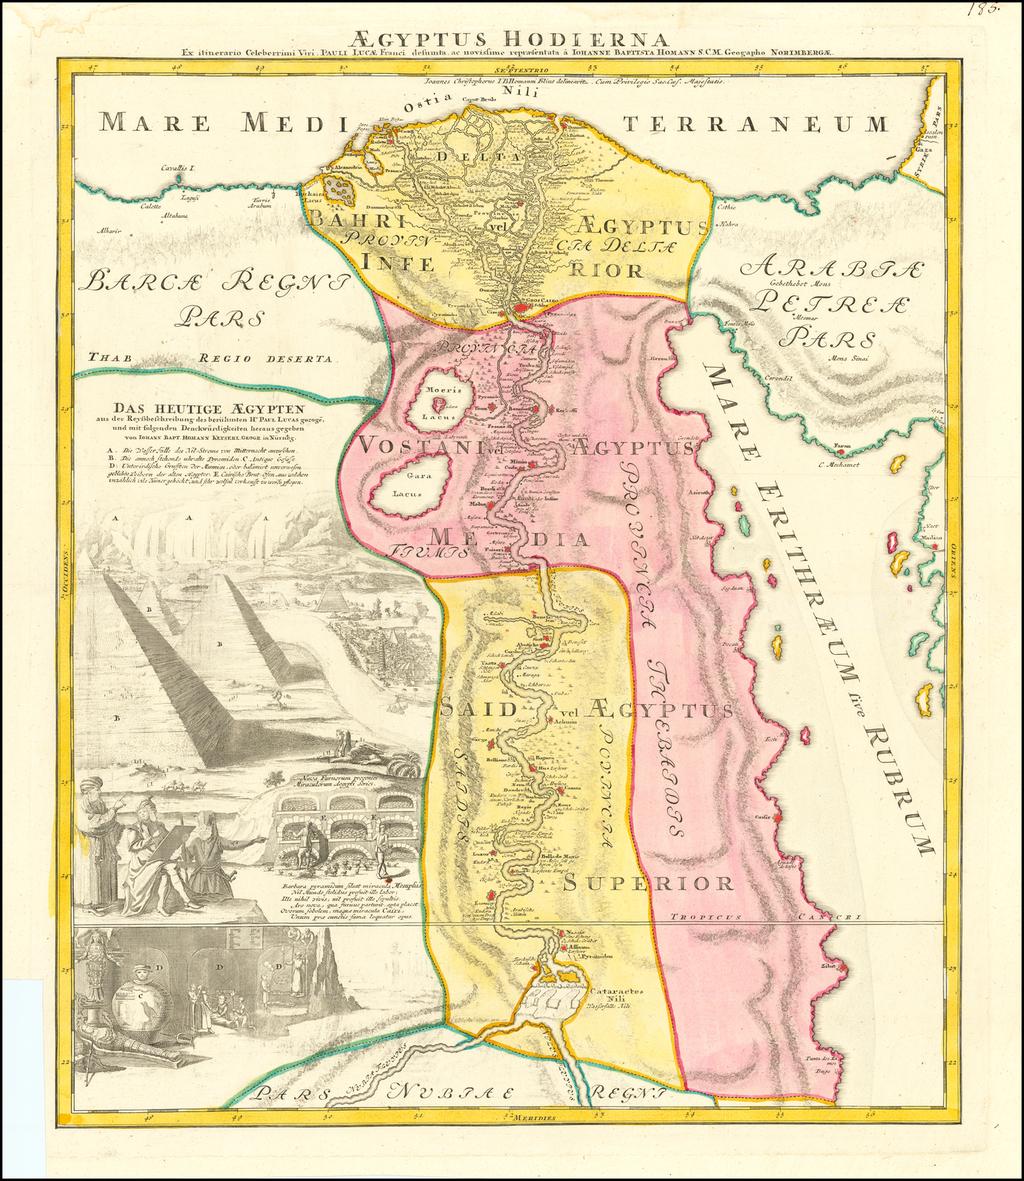 Aegyptus Hodierna Ex itinerario Celeberrimi viri Pauli Lucae, Franci desumta ac novissime repraesentata  By Johann Baptist Homann